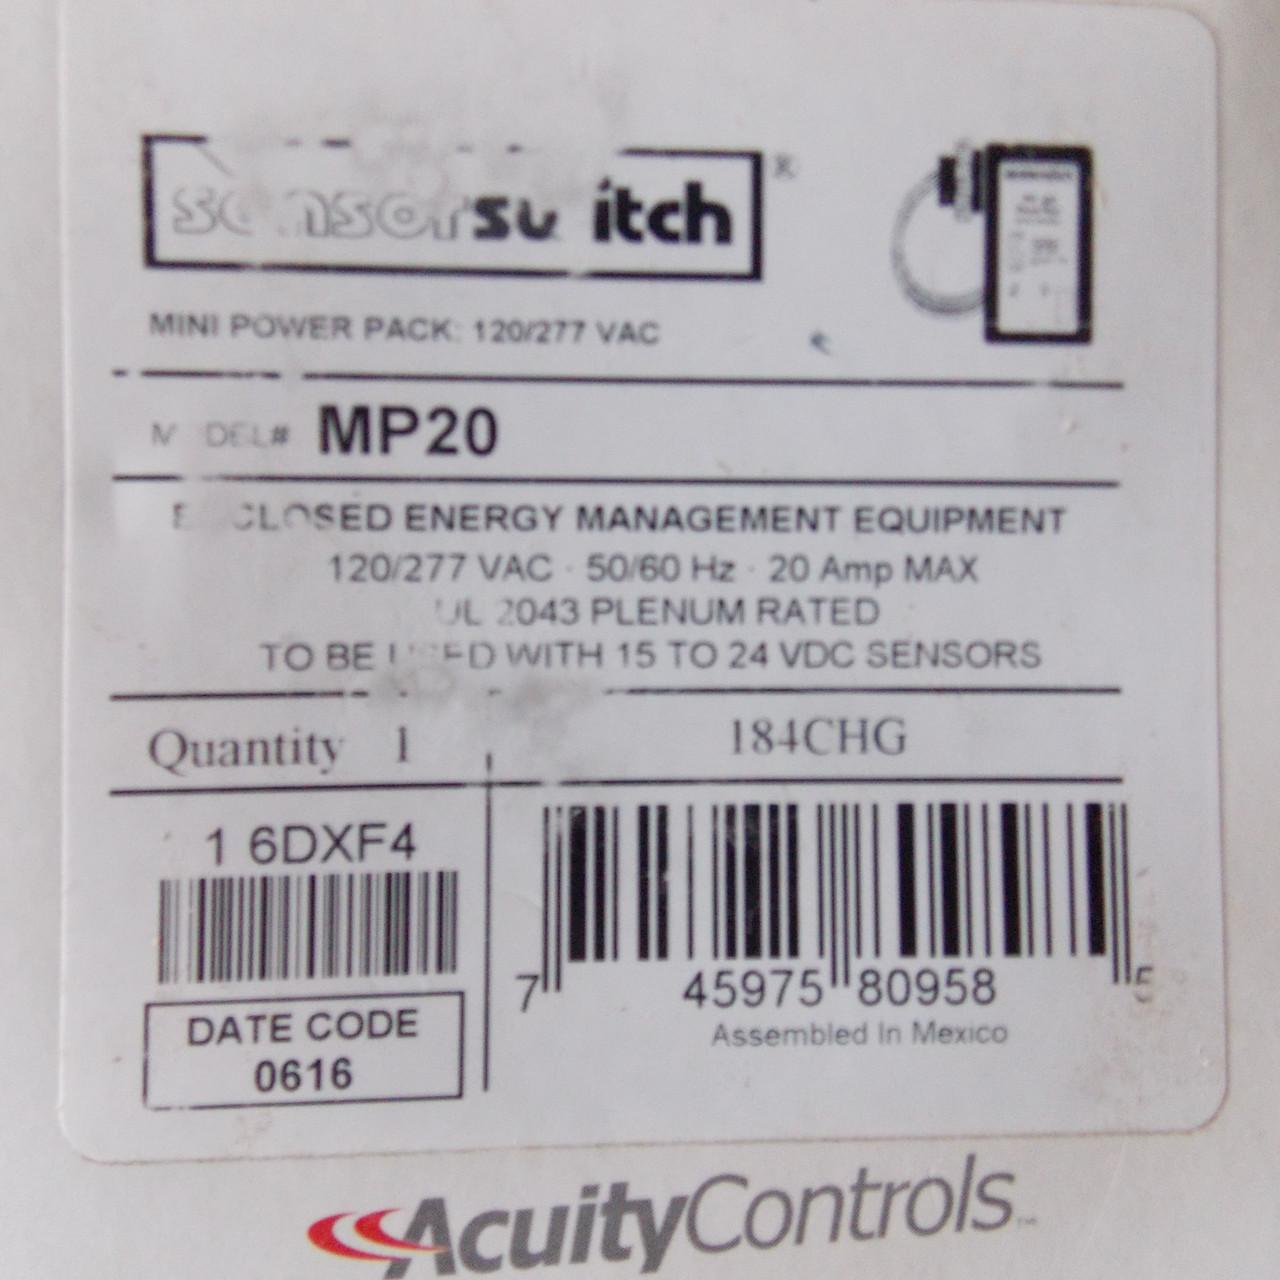 sensorswitch PP-20 Power Pack 120//277 VAC 20 Amp for 15 TO 24 VDC Sensors